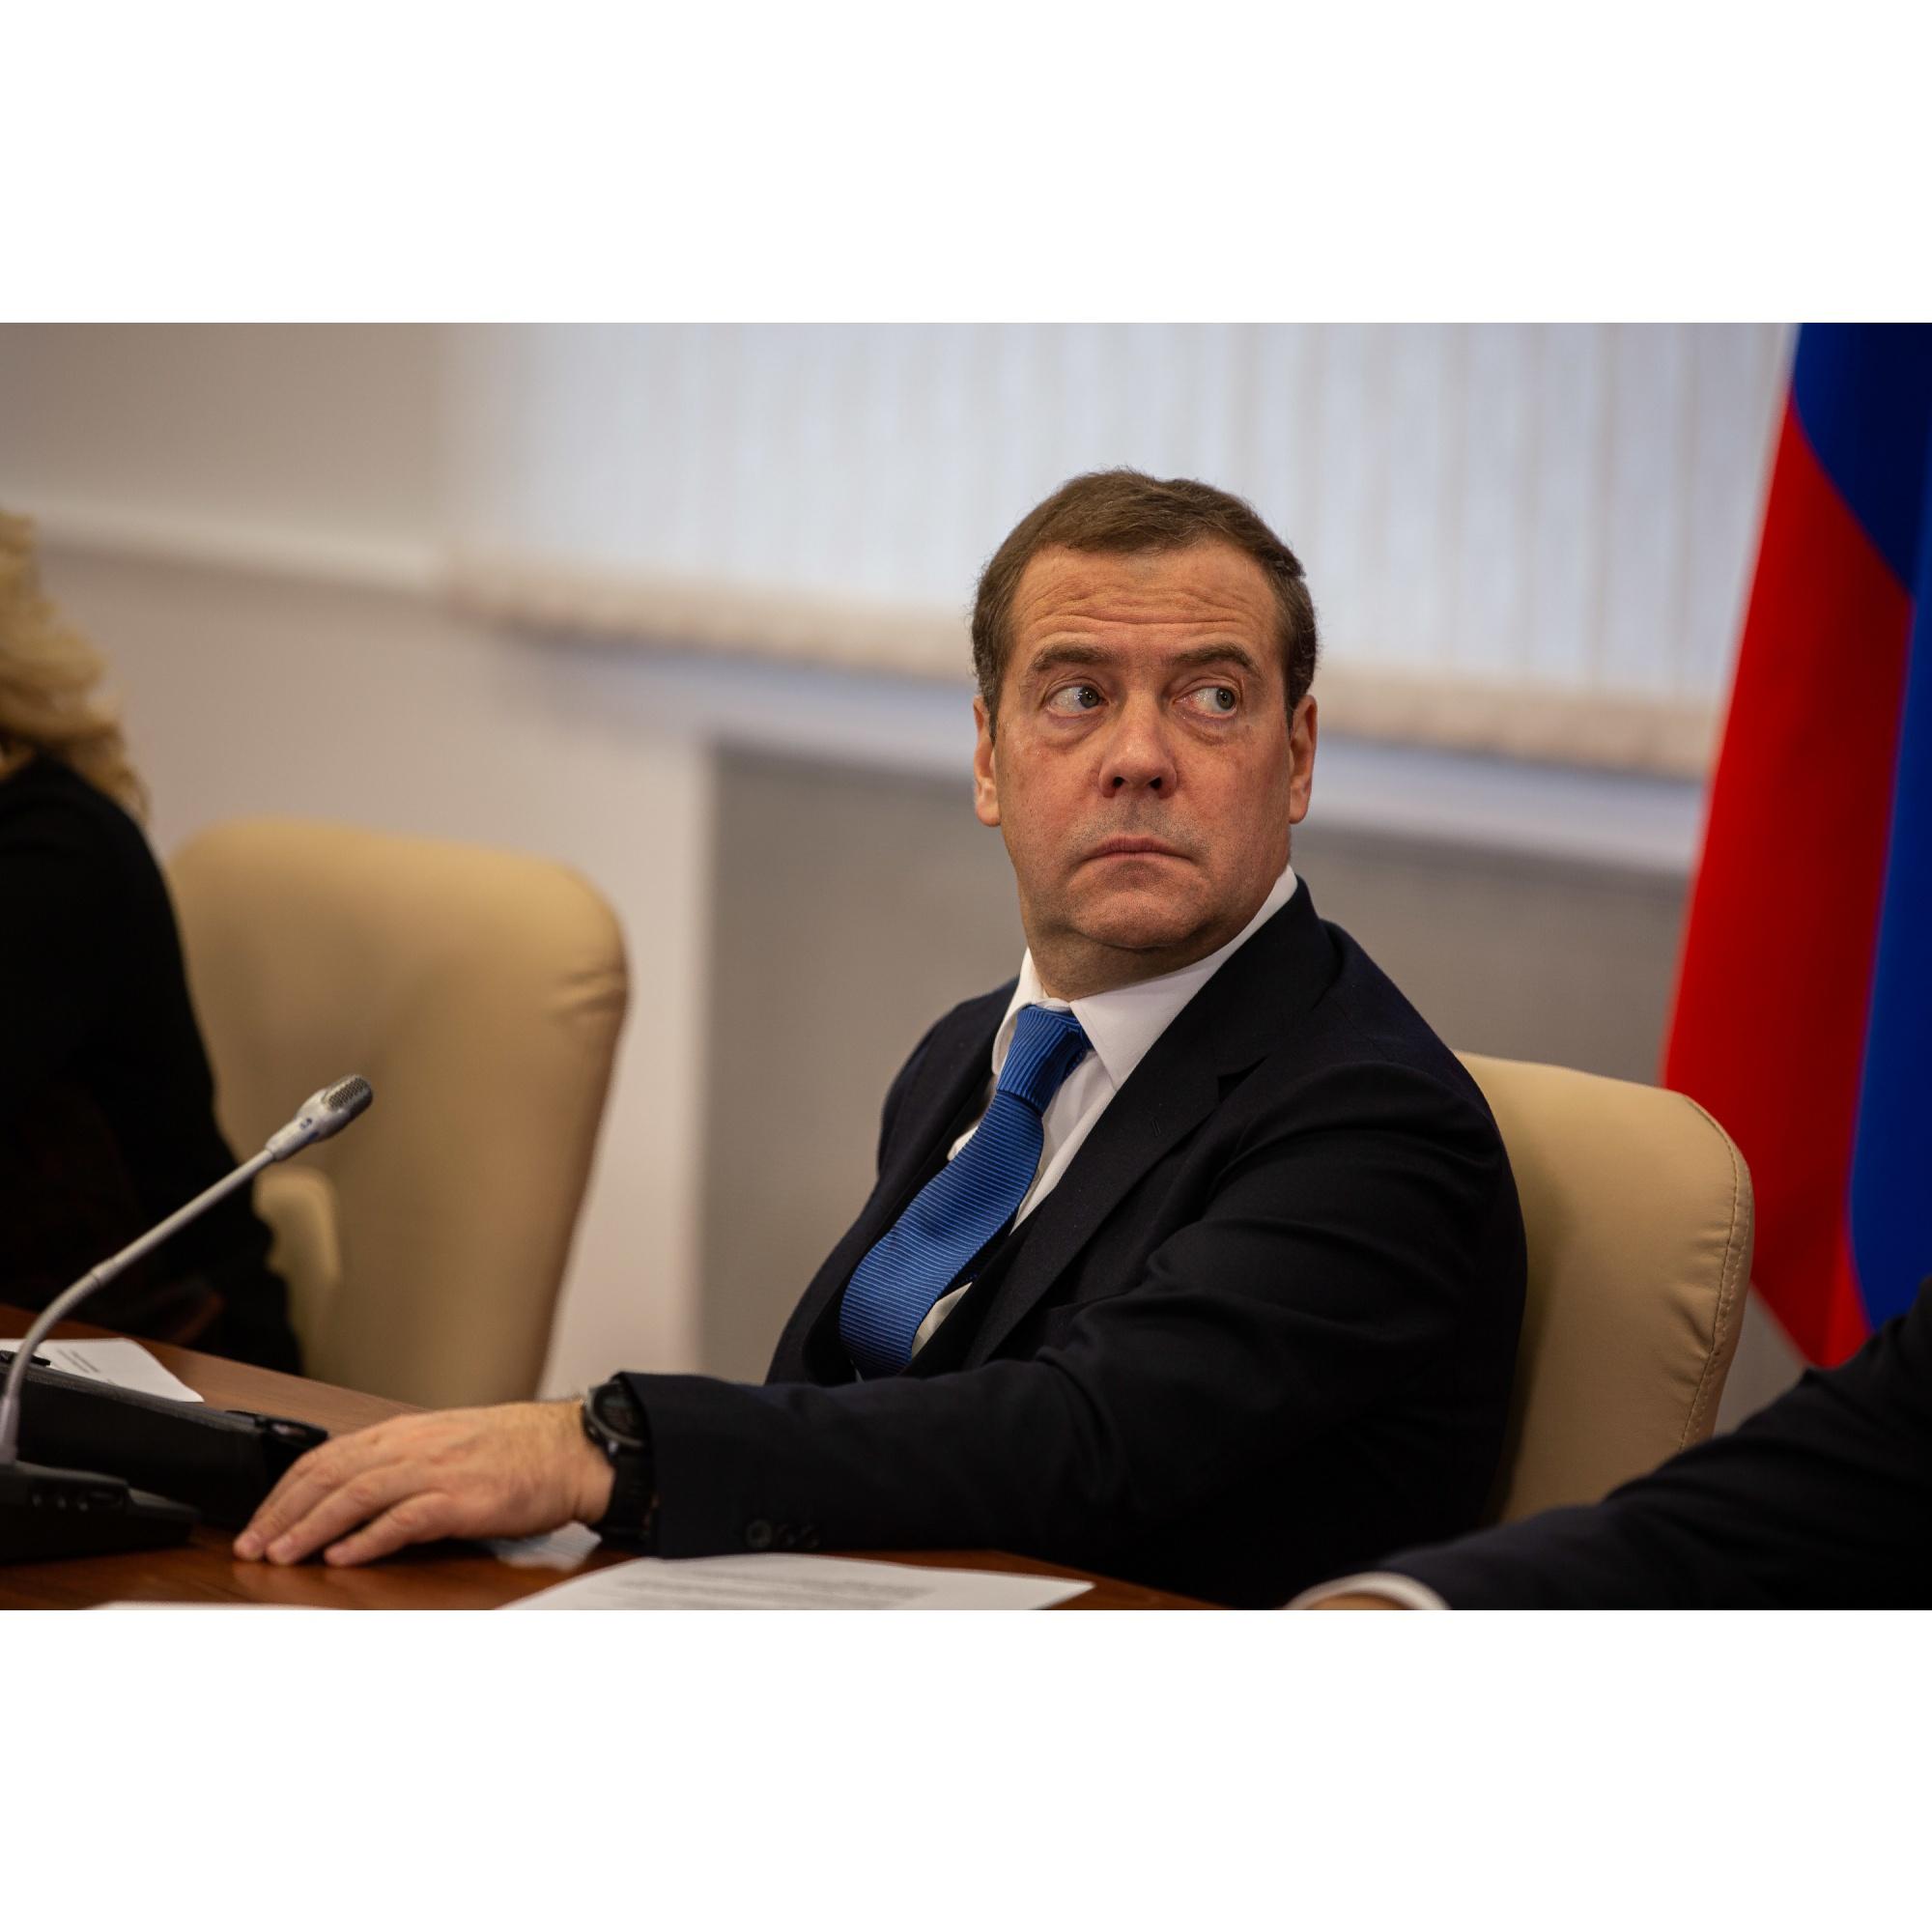 В день визита Медведева